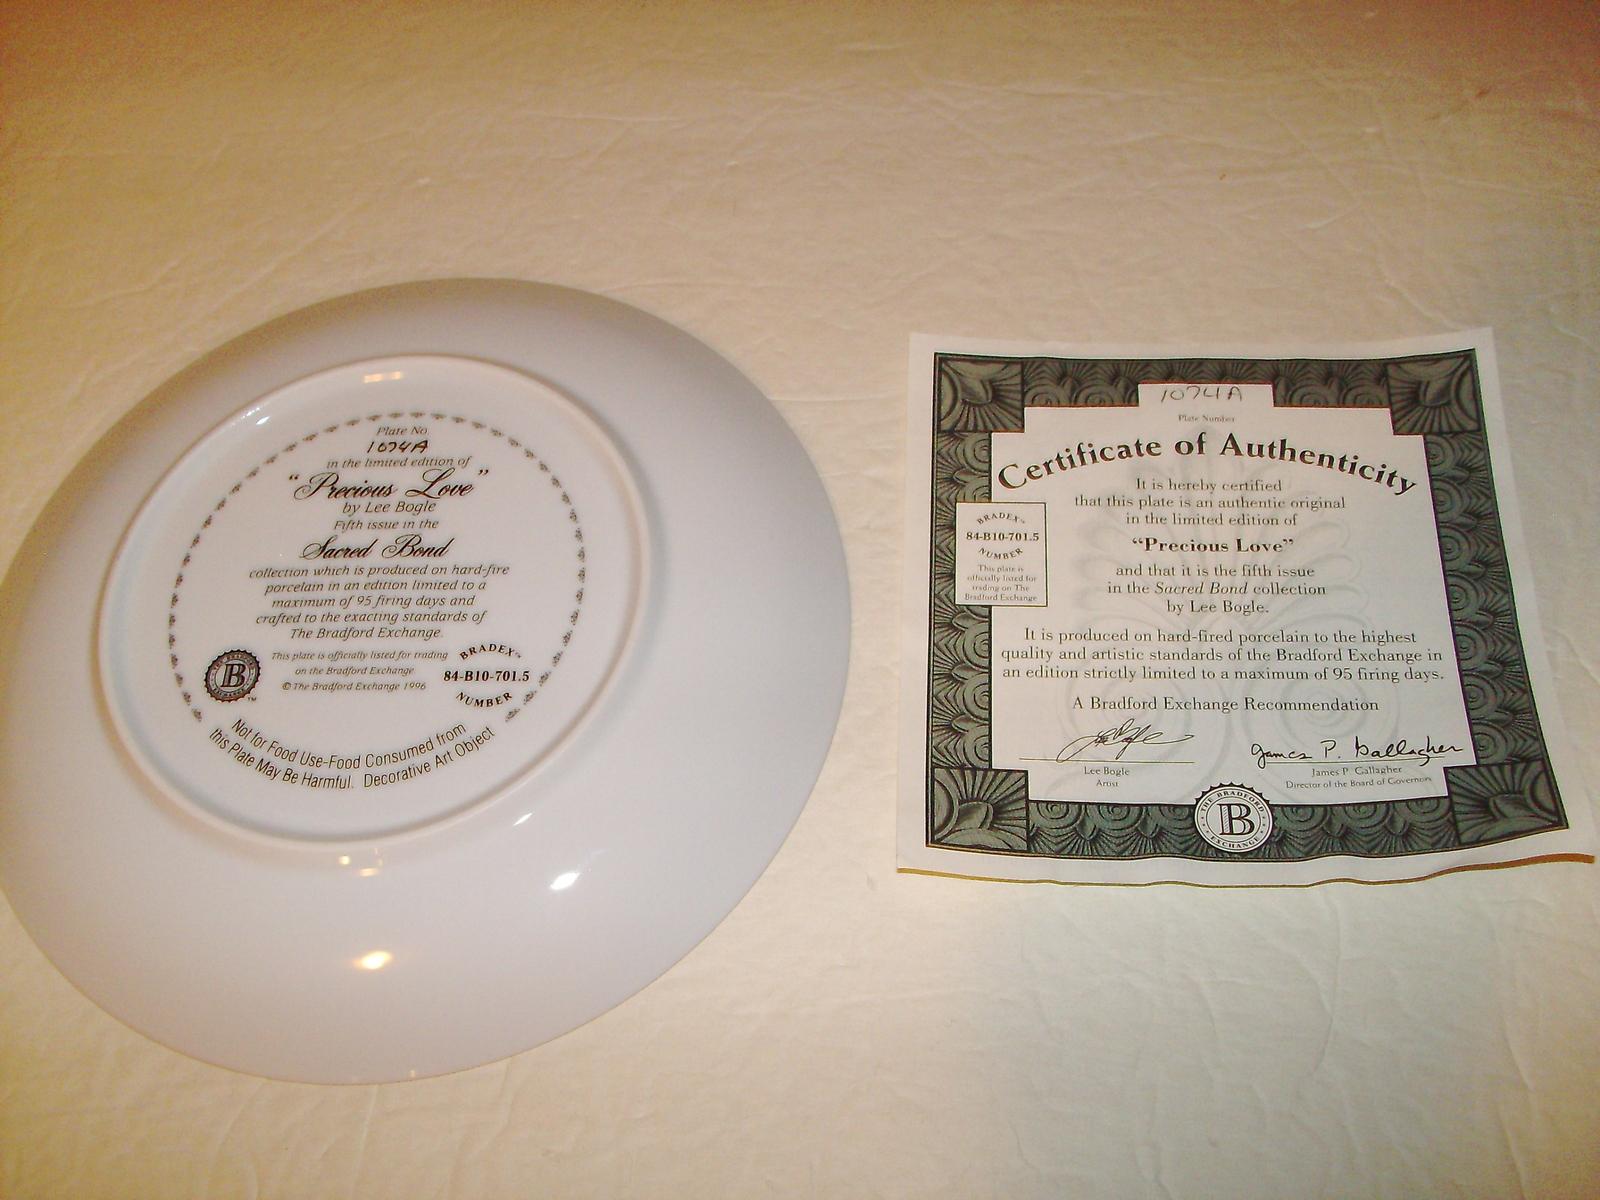 Bradford Exchange Collector Plate: Precious Love -Lee Bogle- 84-B10-701.5 + COA